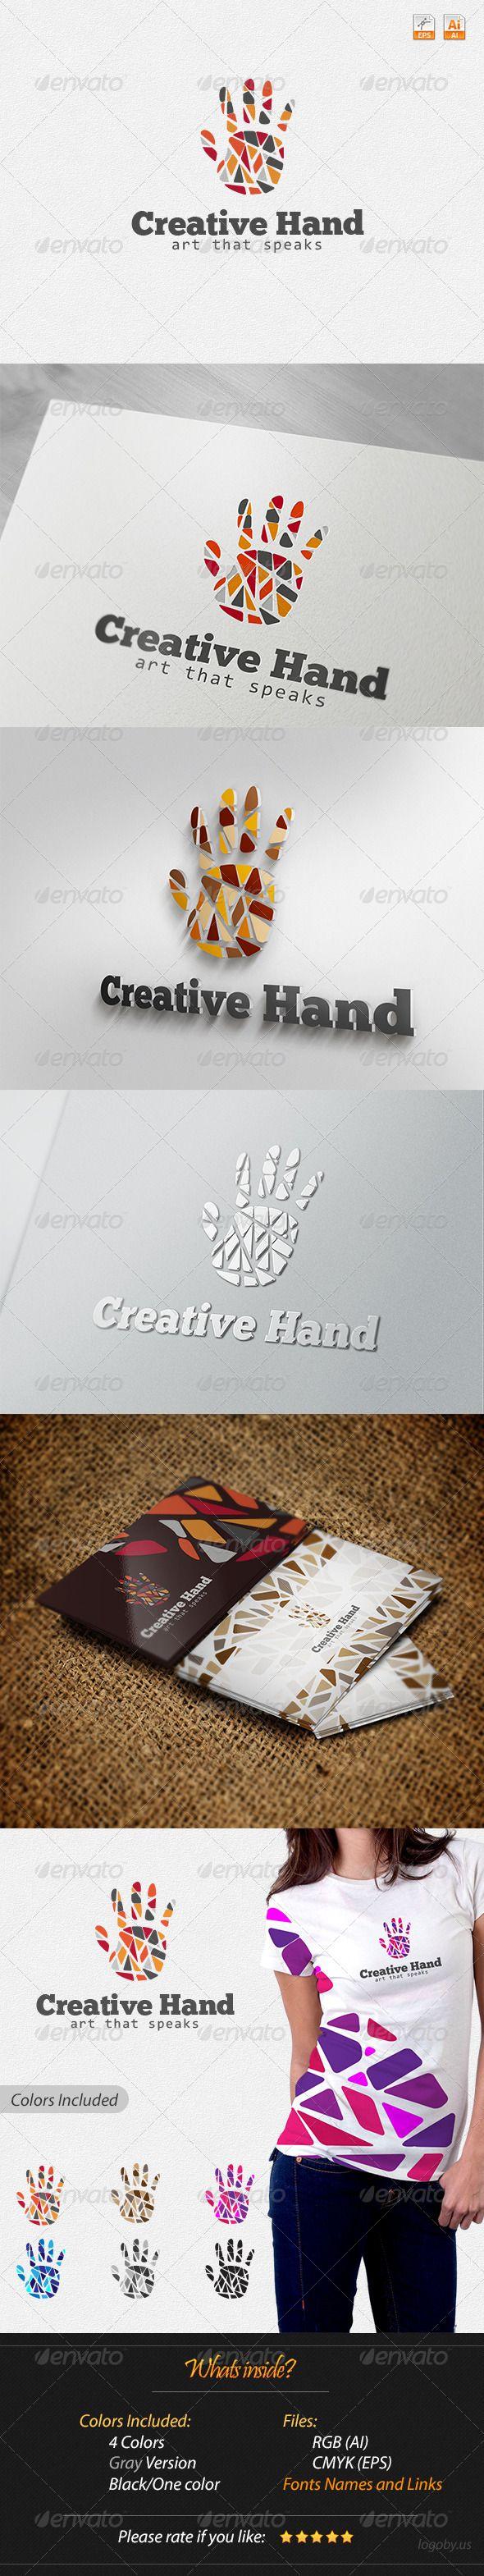 Creative Hand - Art that Speaks Logo